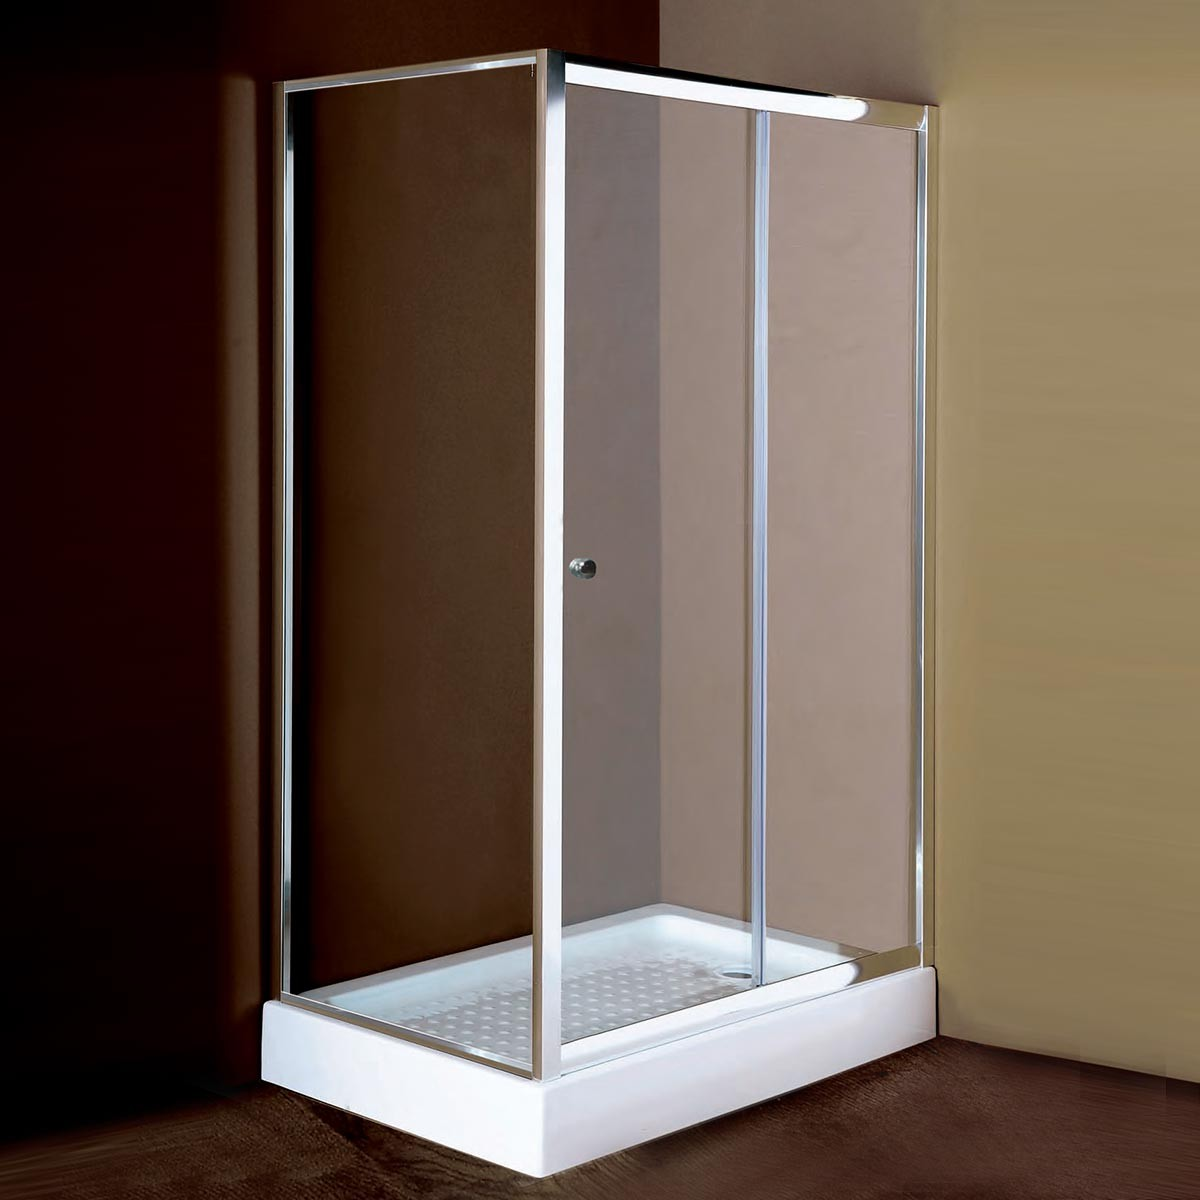 31 x 47 In. Shower Enclosure (DK-D108-80)   Decoraport USA